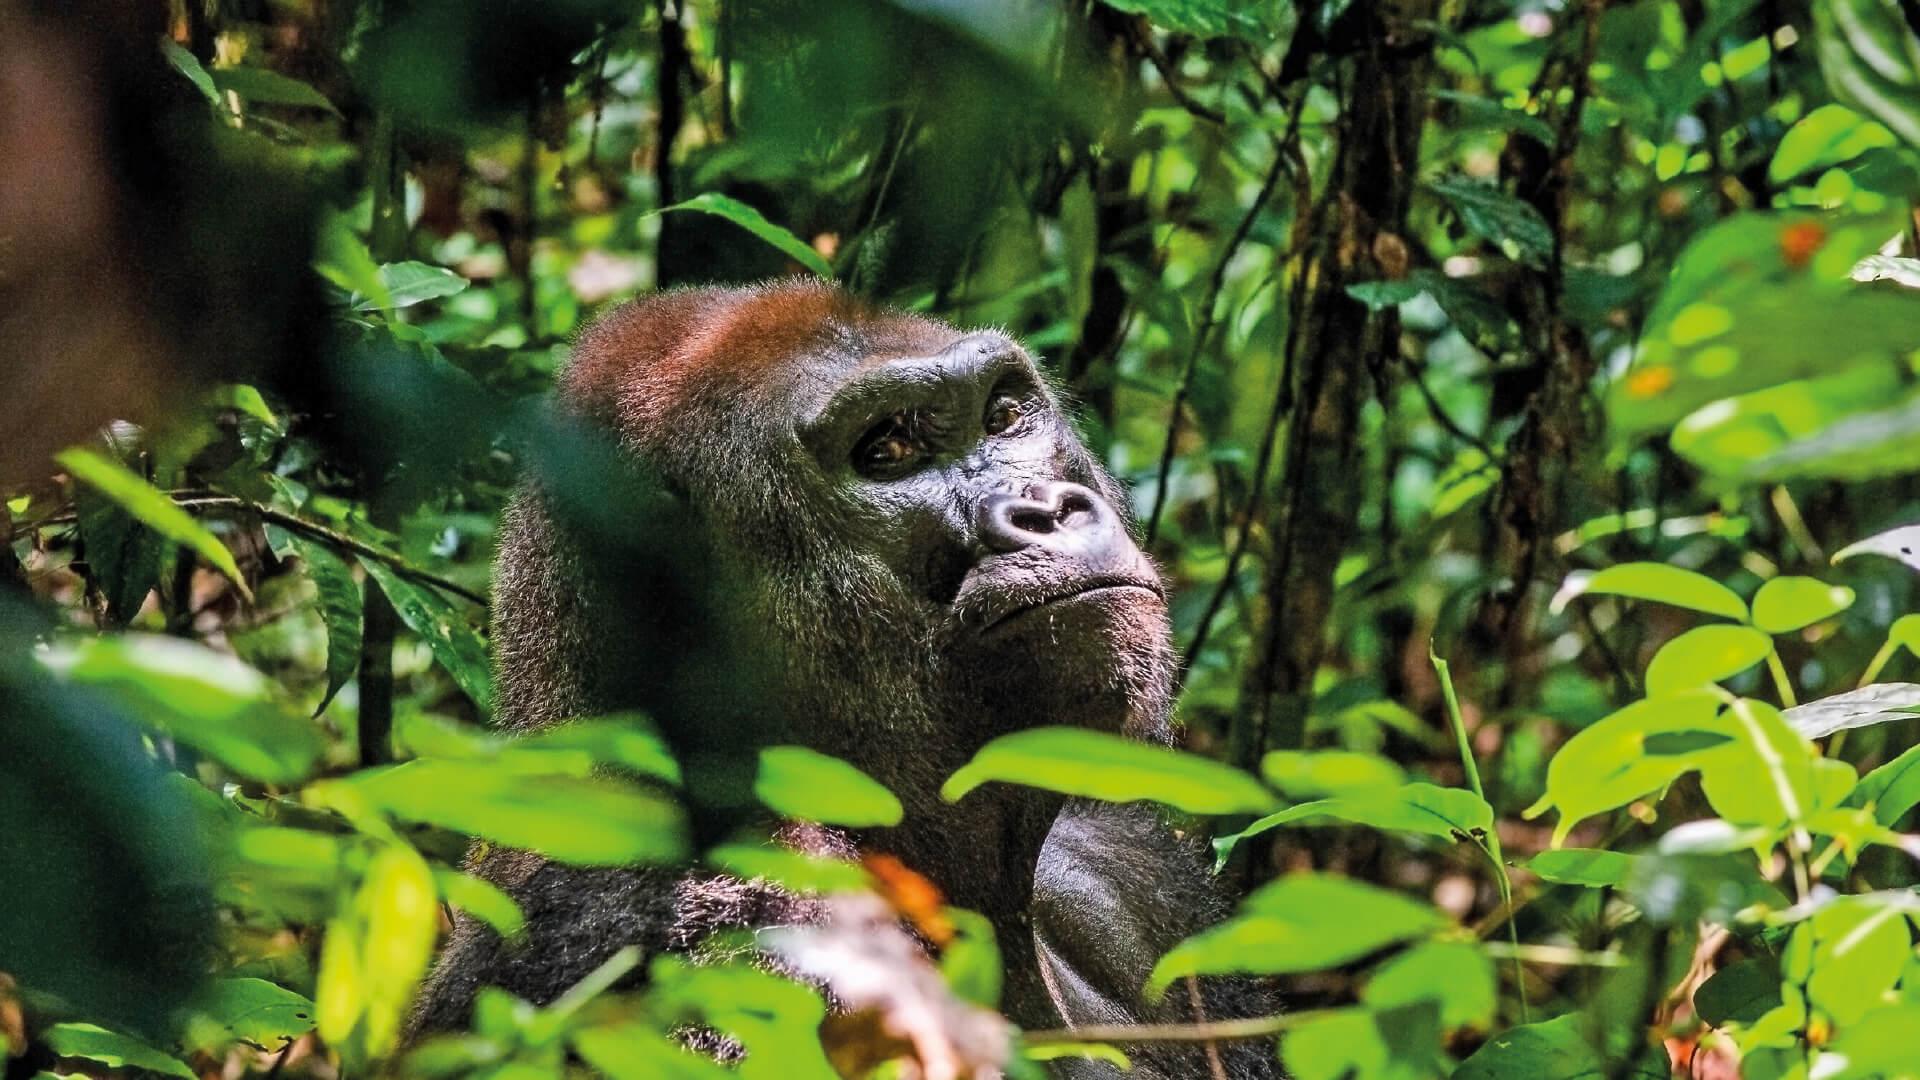 Western lowland gorilla in-situ, looking at camera